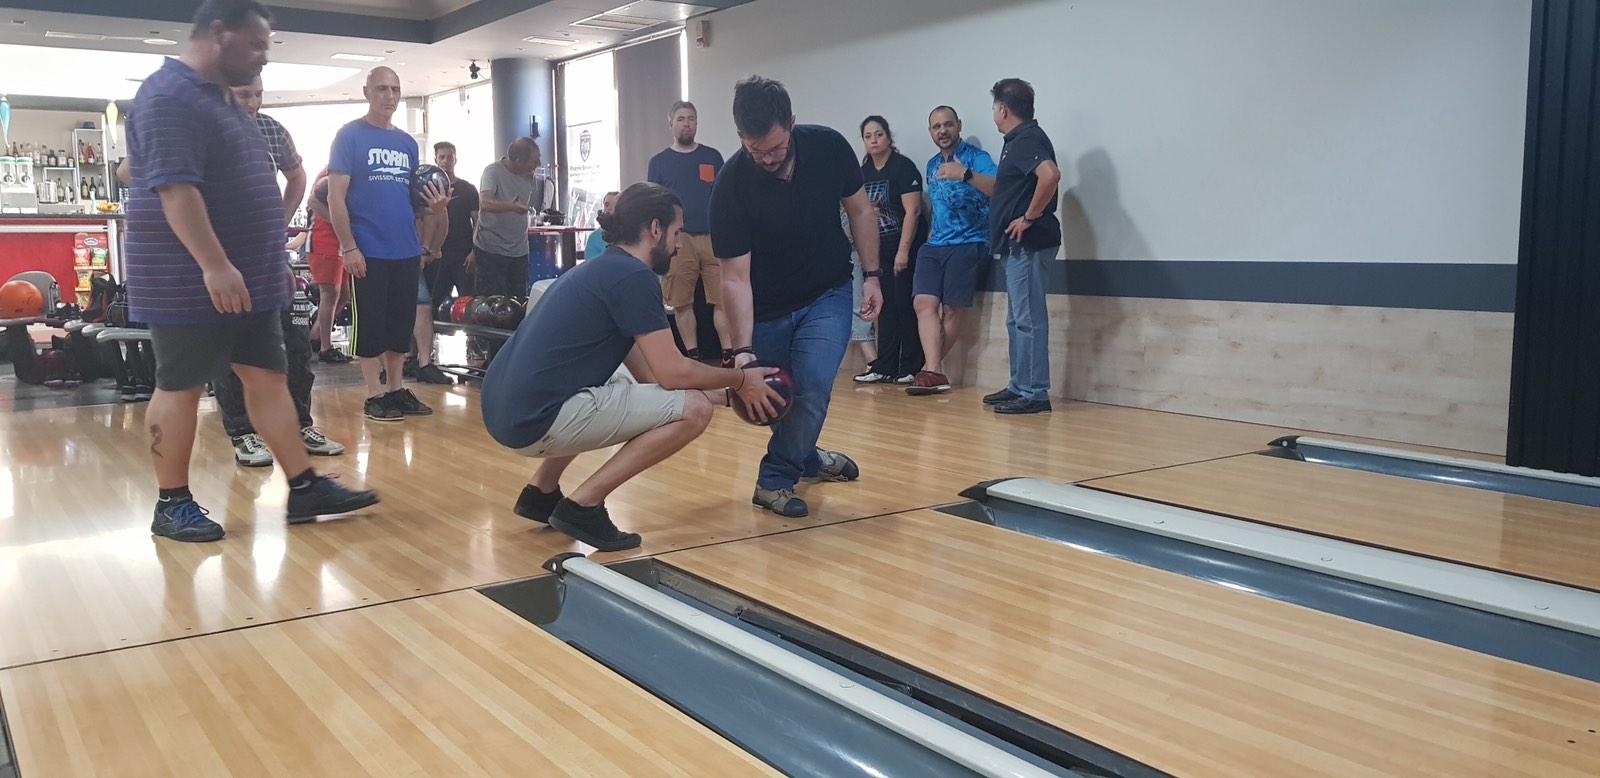 sxoli-bowling-10